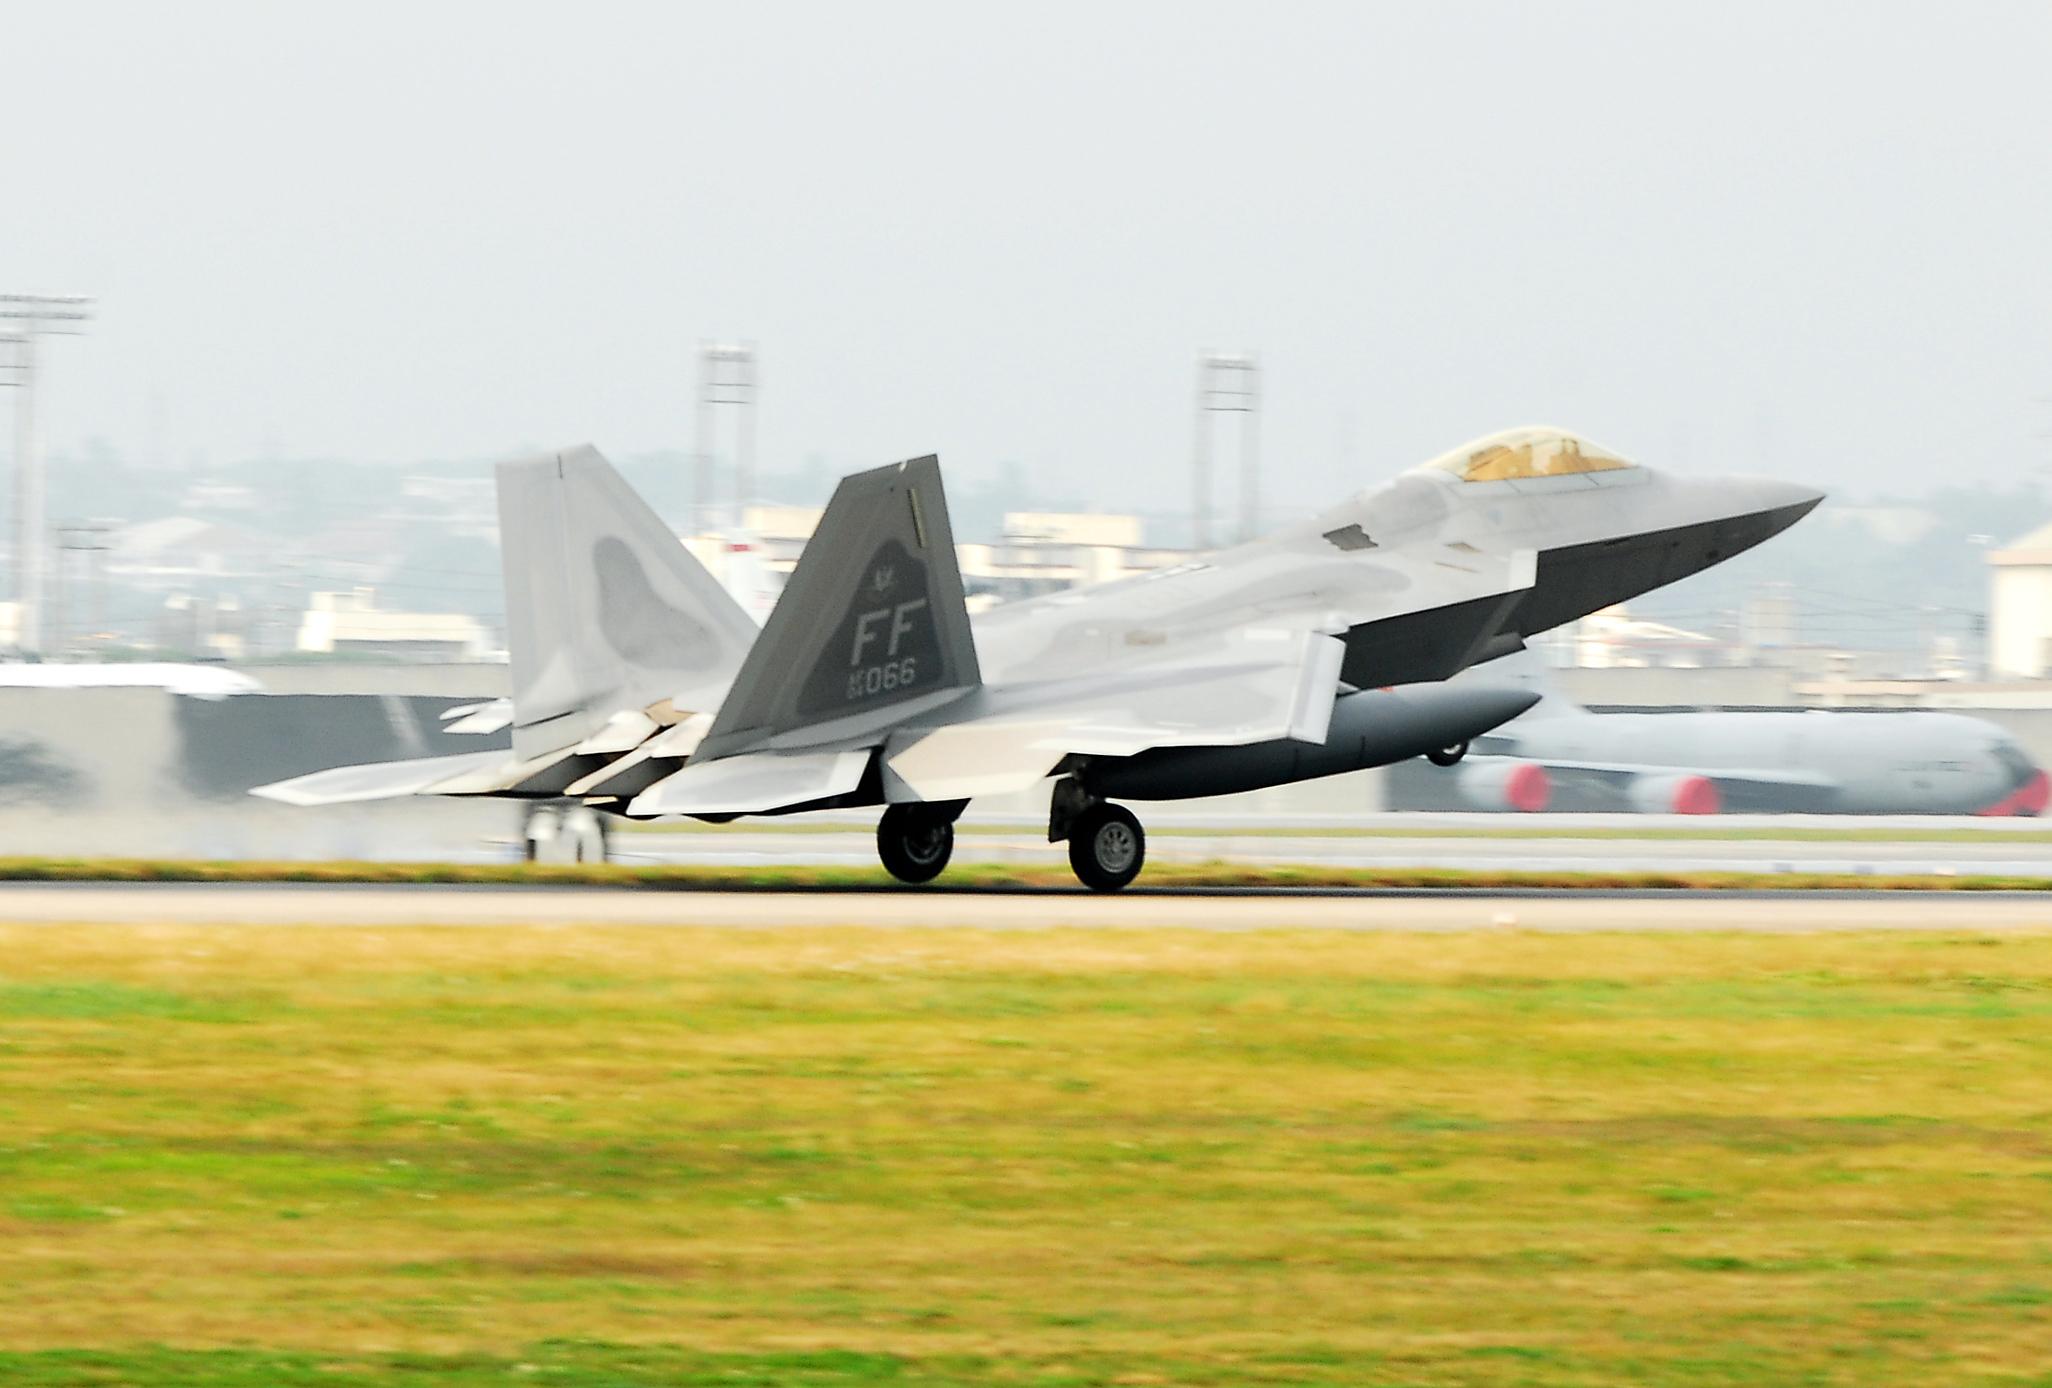 F 22 (戦闘機)の画像 p1_40